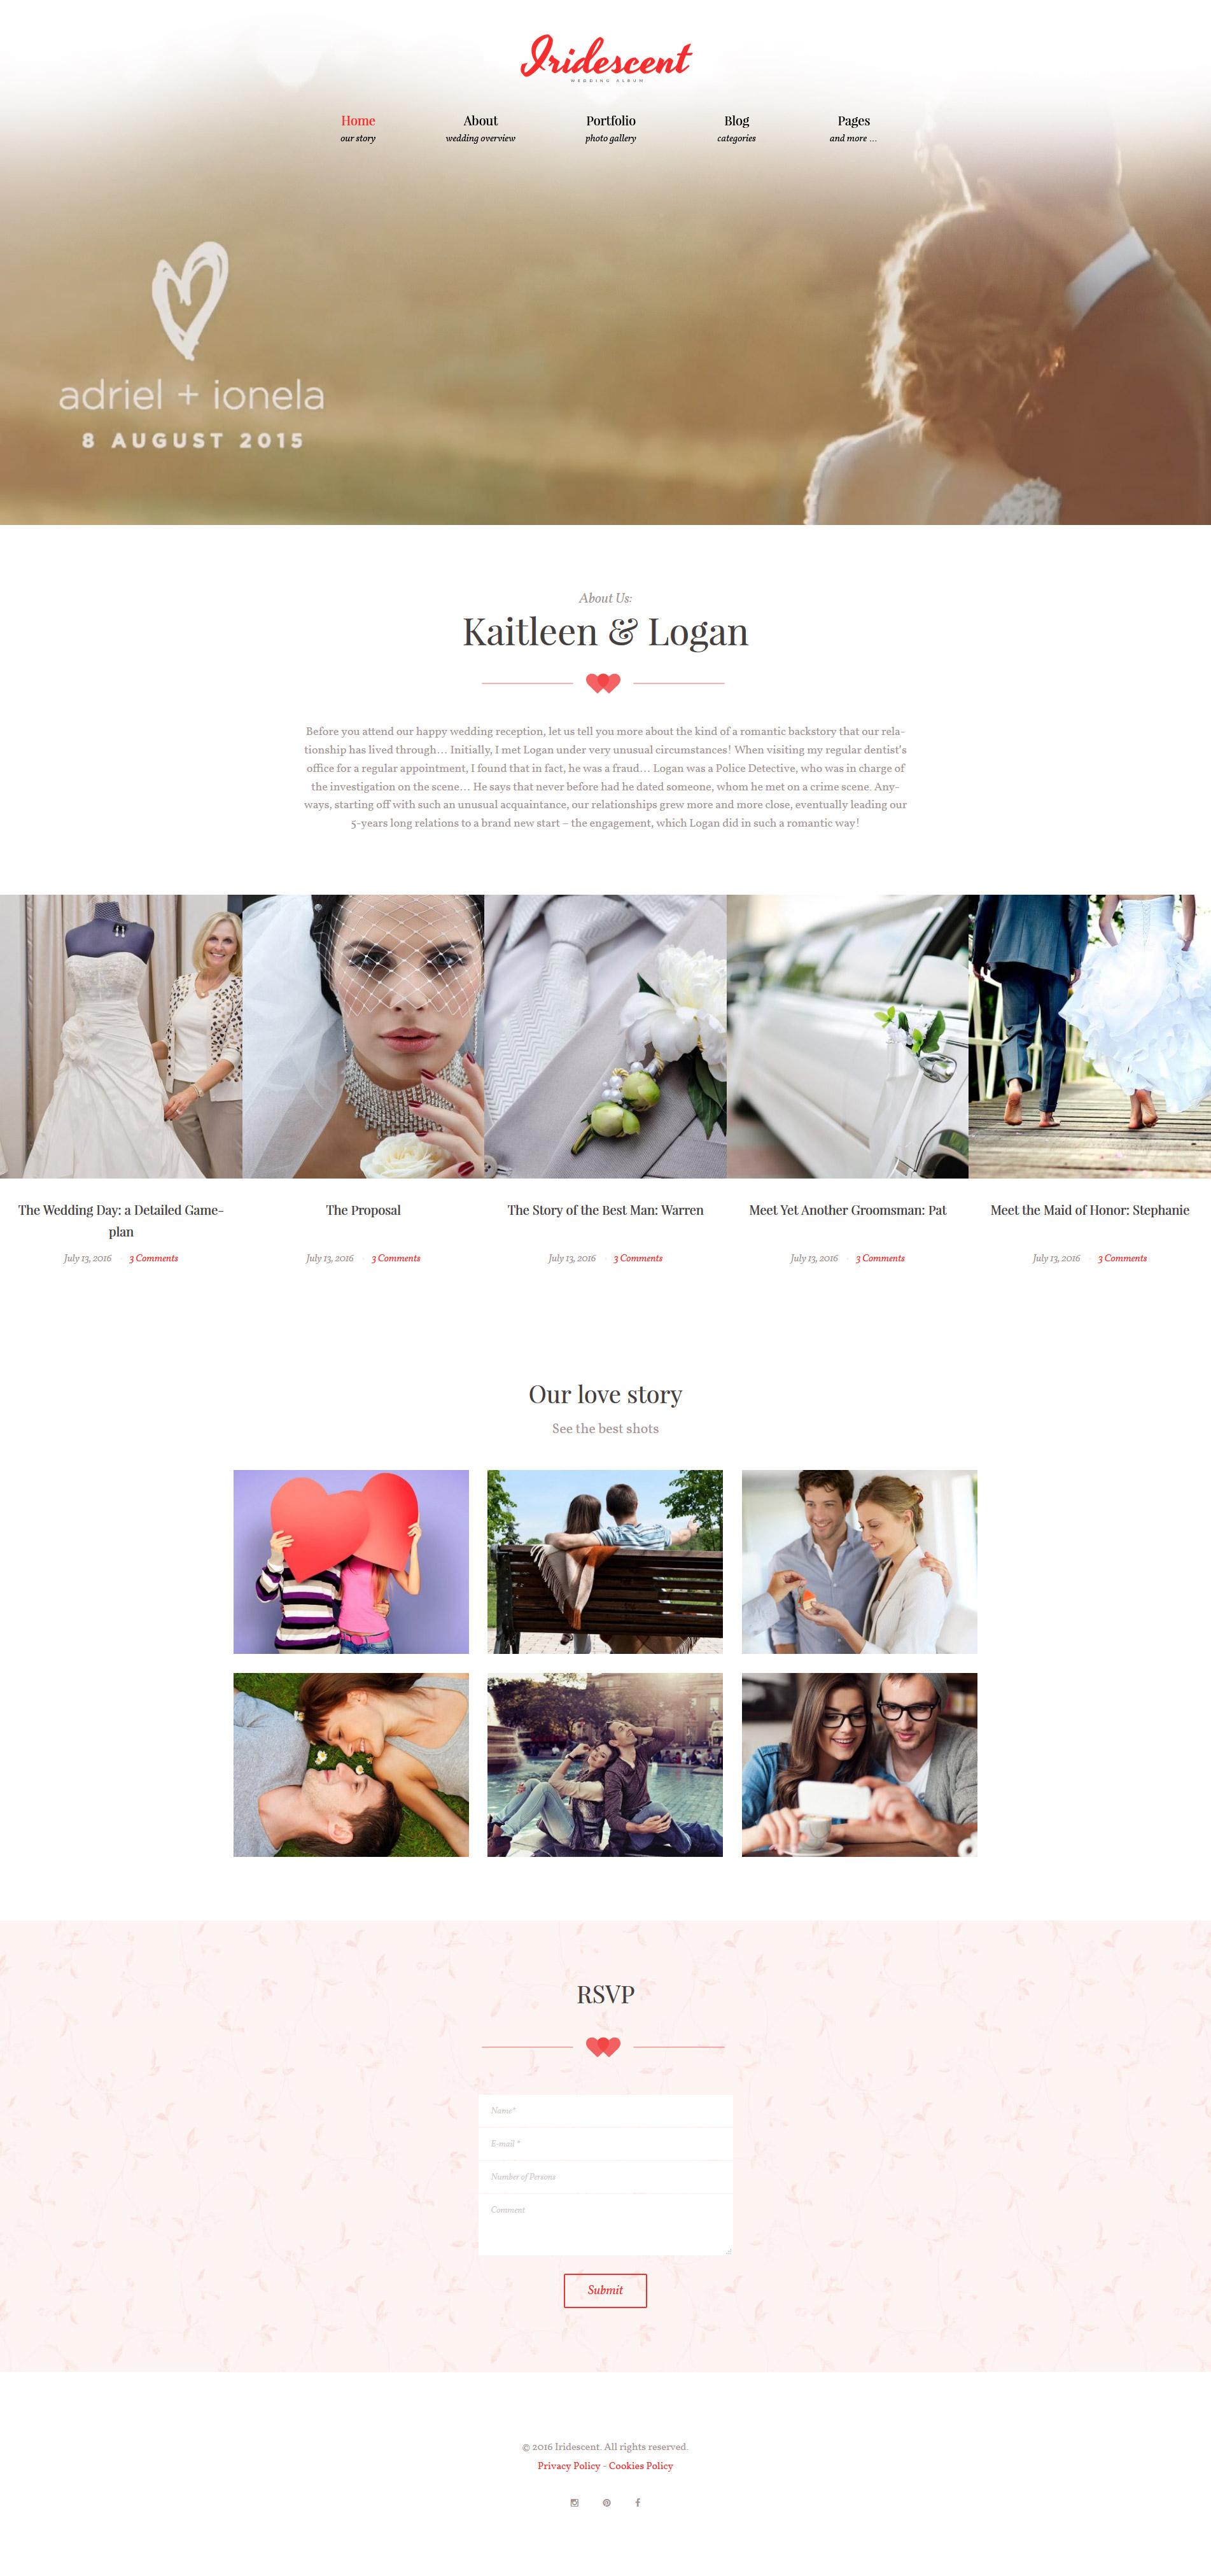 Responsivt Iridescent - Marriage & Wedding WordPress-tema #62018 - skärmbild